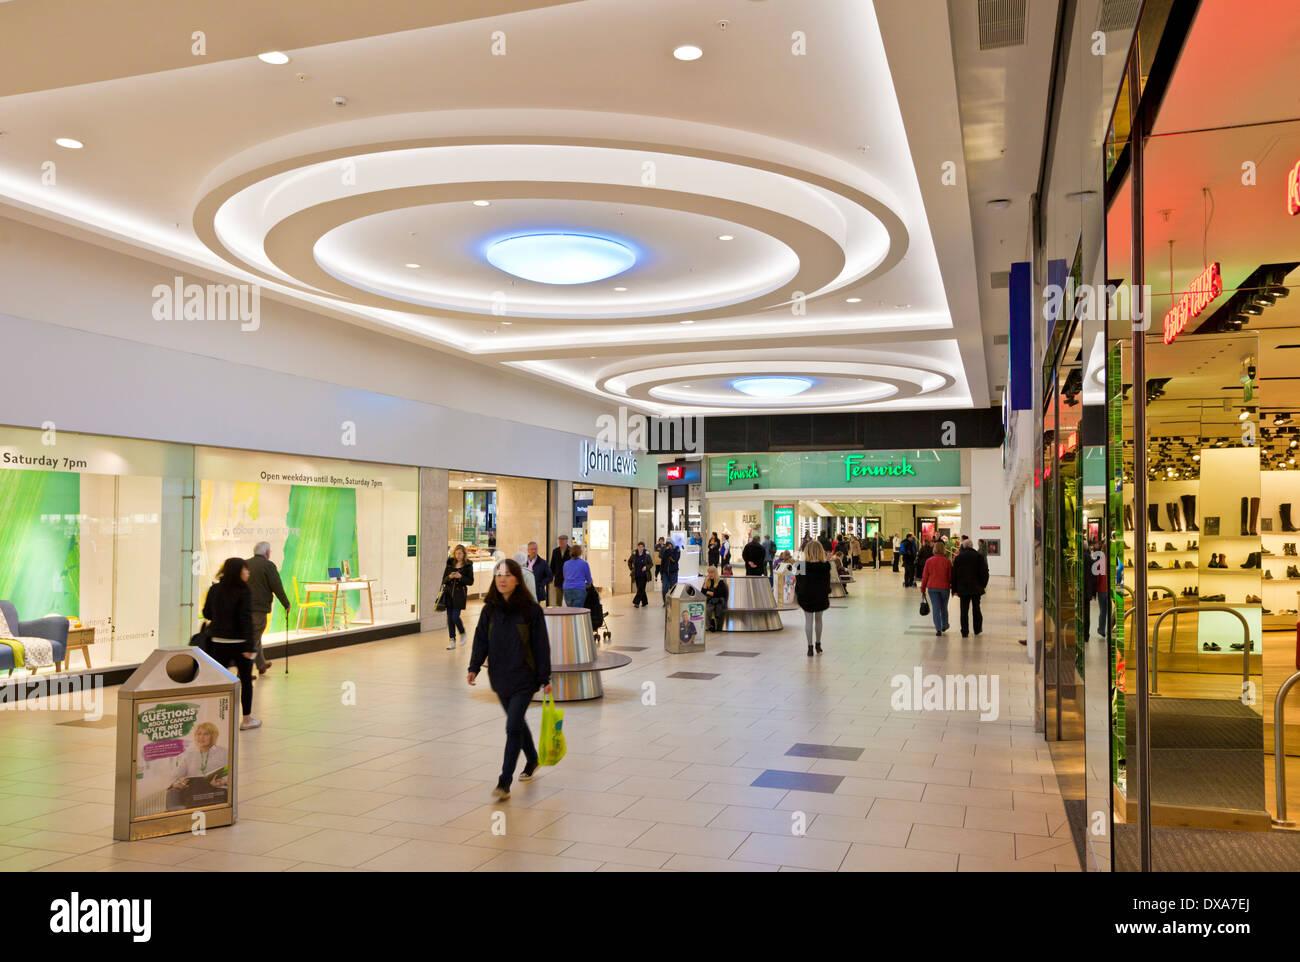 Shopping inside the Eldon square shopping centre Newcastle upon Tyne city centre Tyne and Wear England GB UK - Stock Image